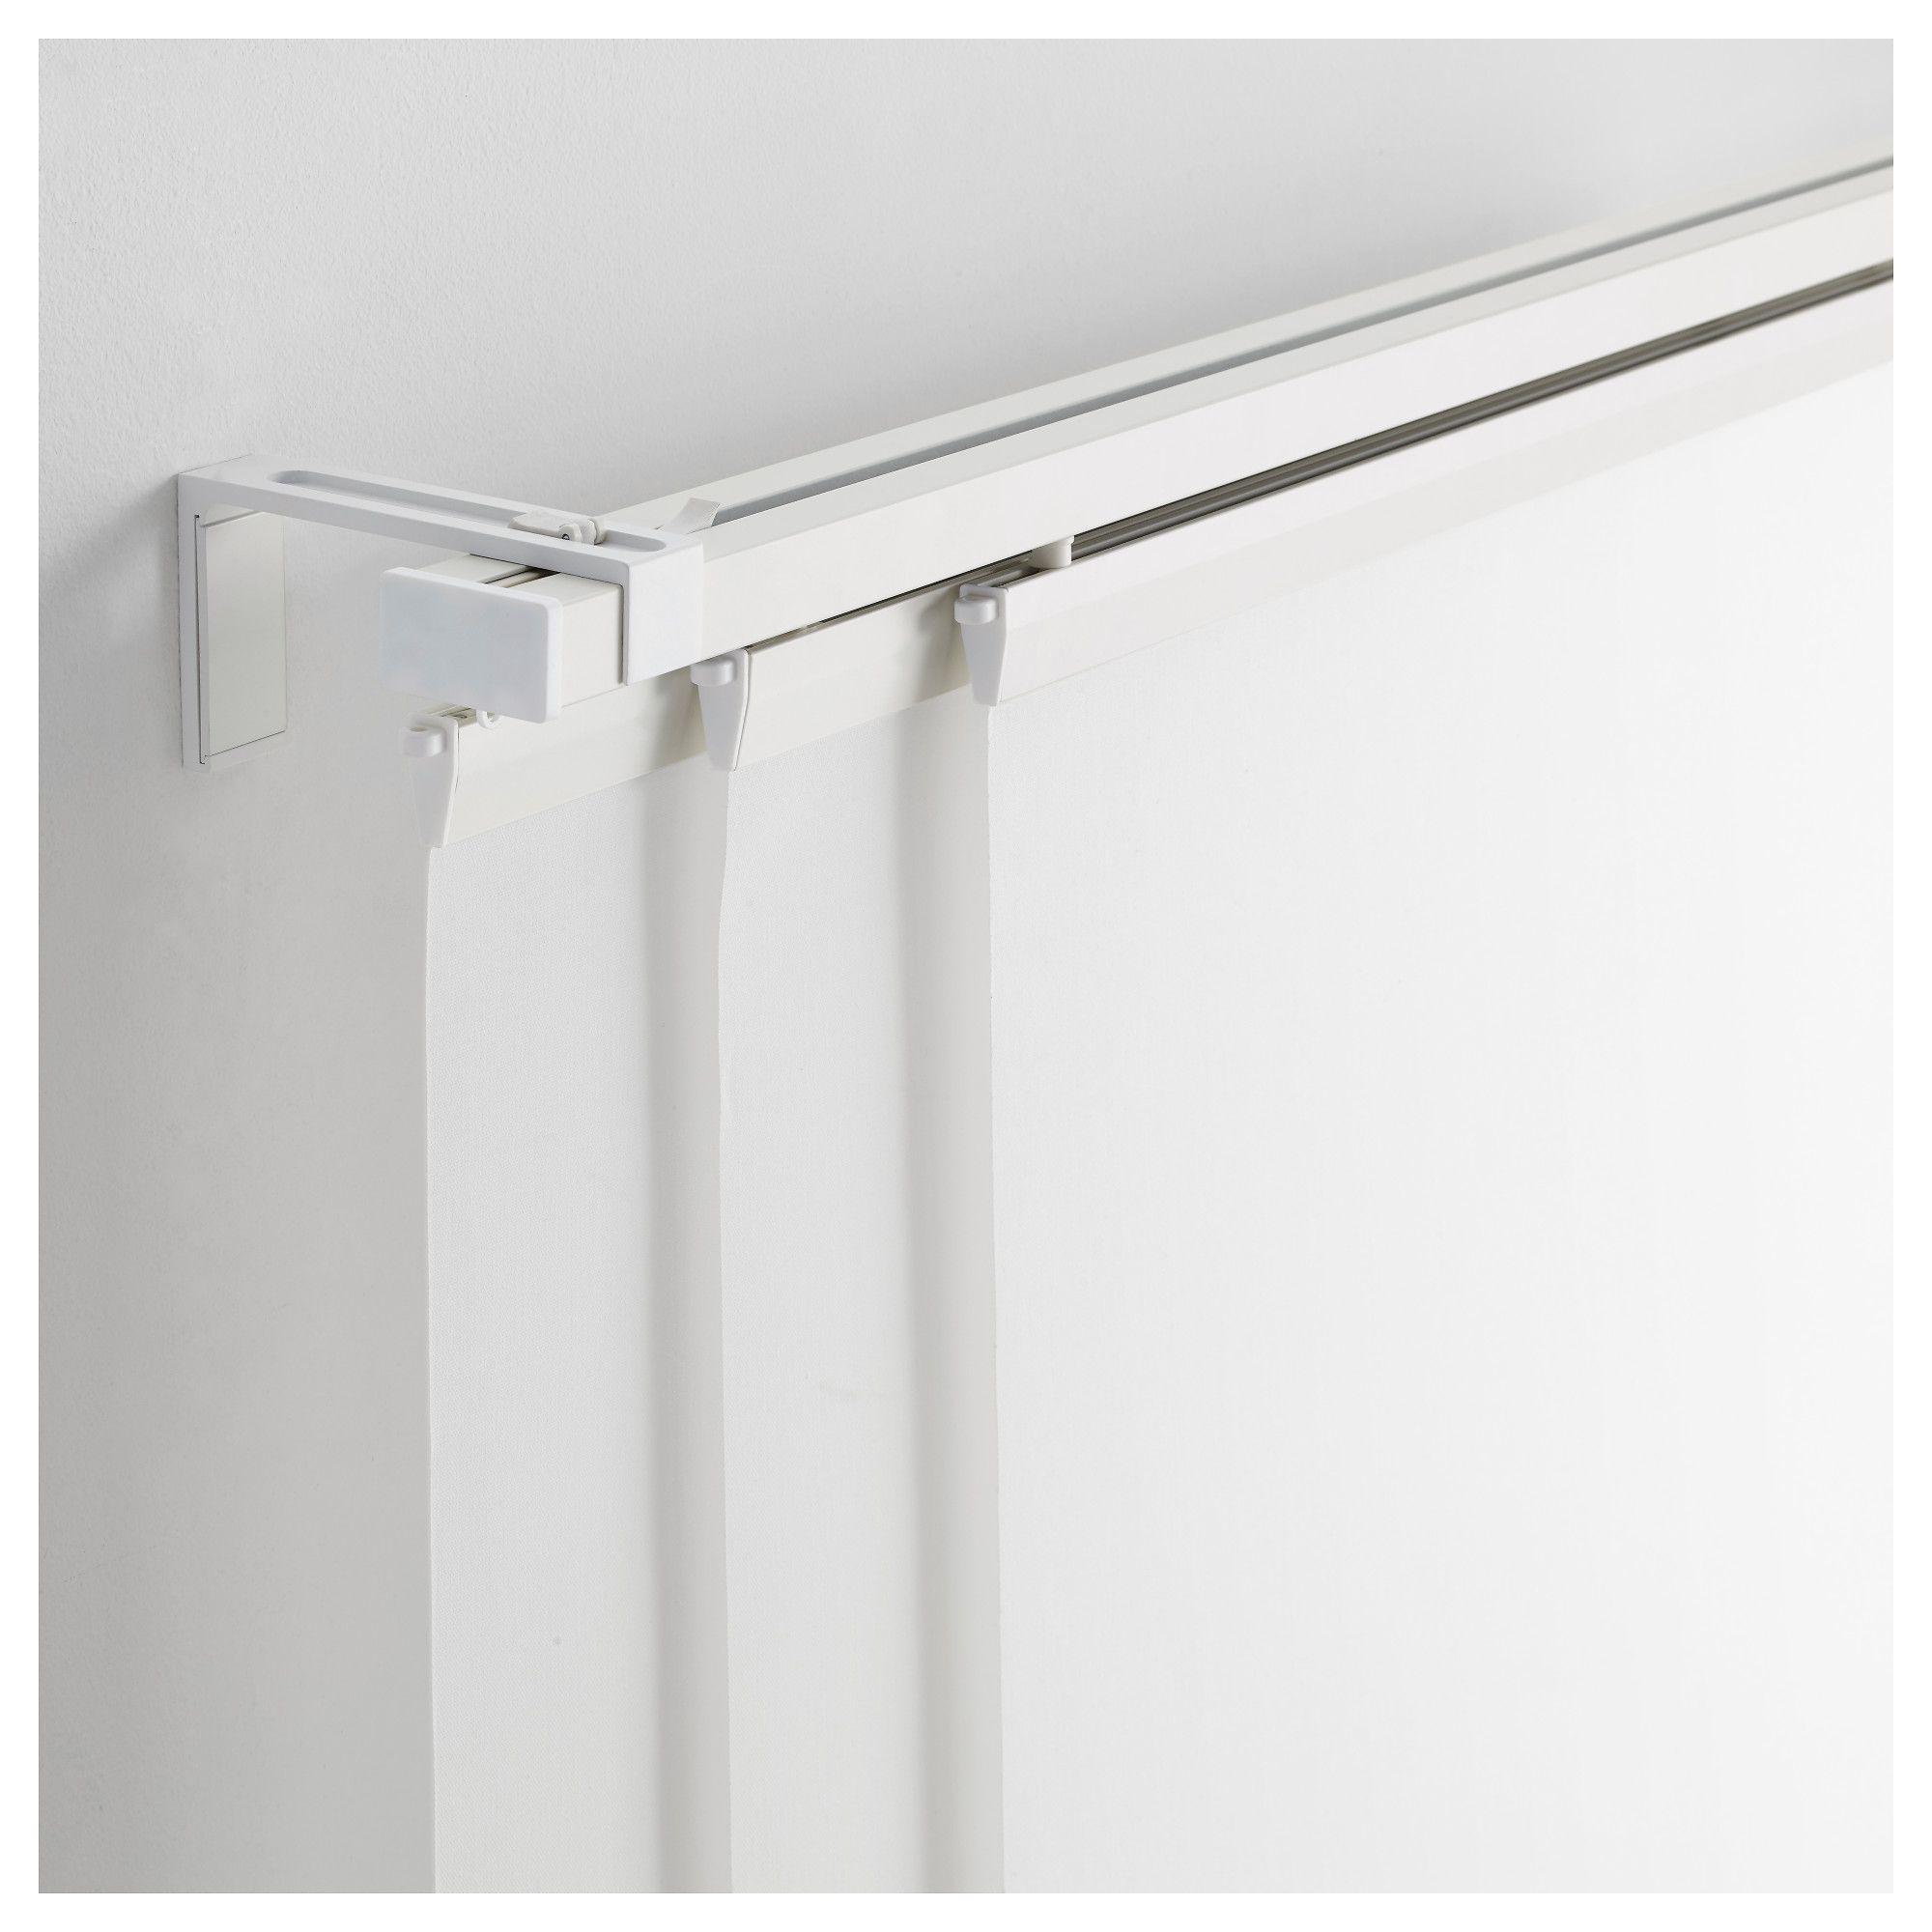 VIDGA τριπλή ράγα κουρτίνας - IKEA | Decorations | Pinterest ...